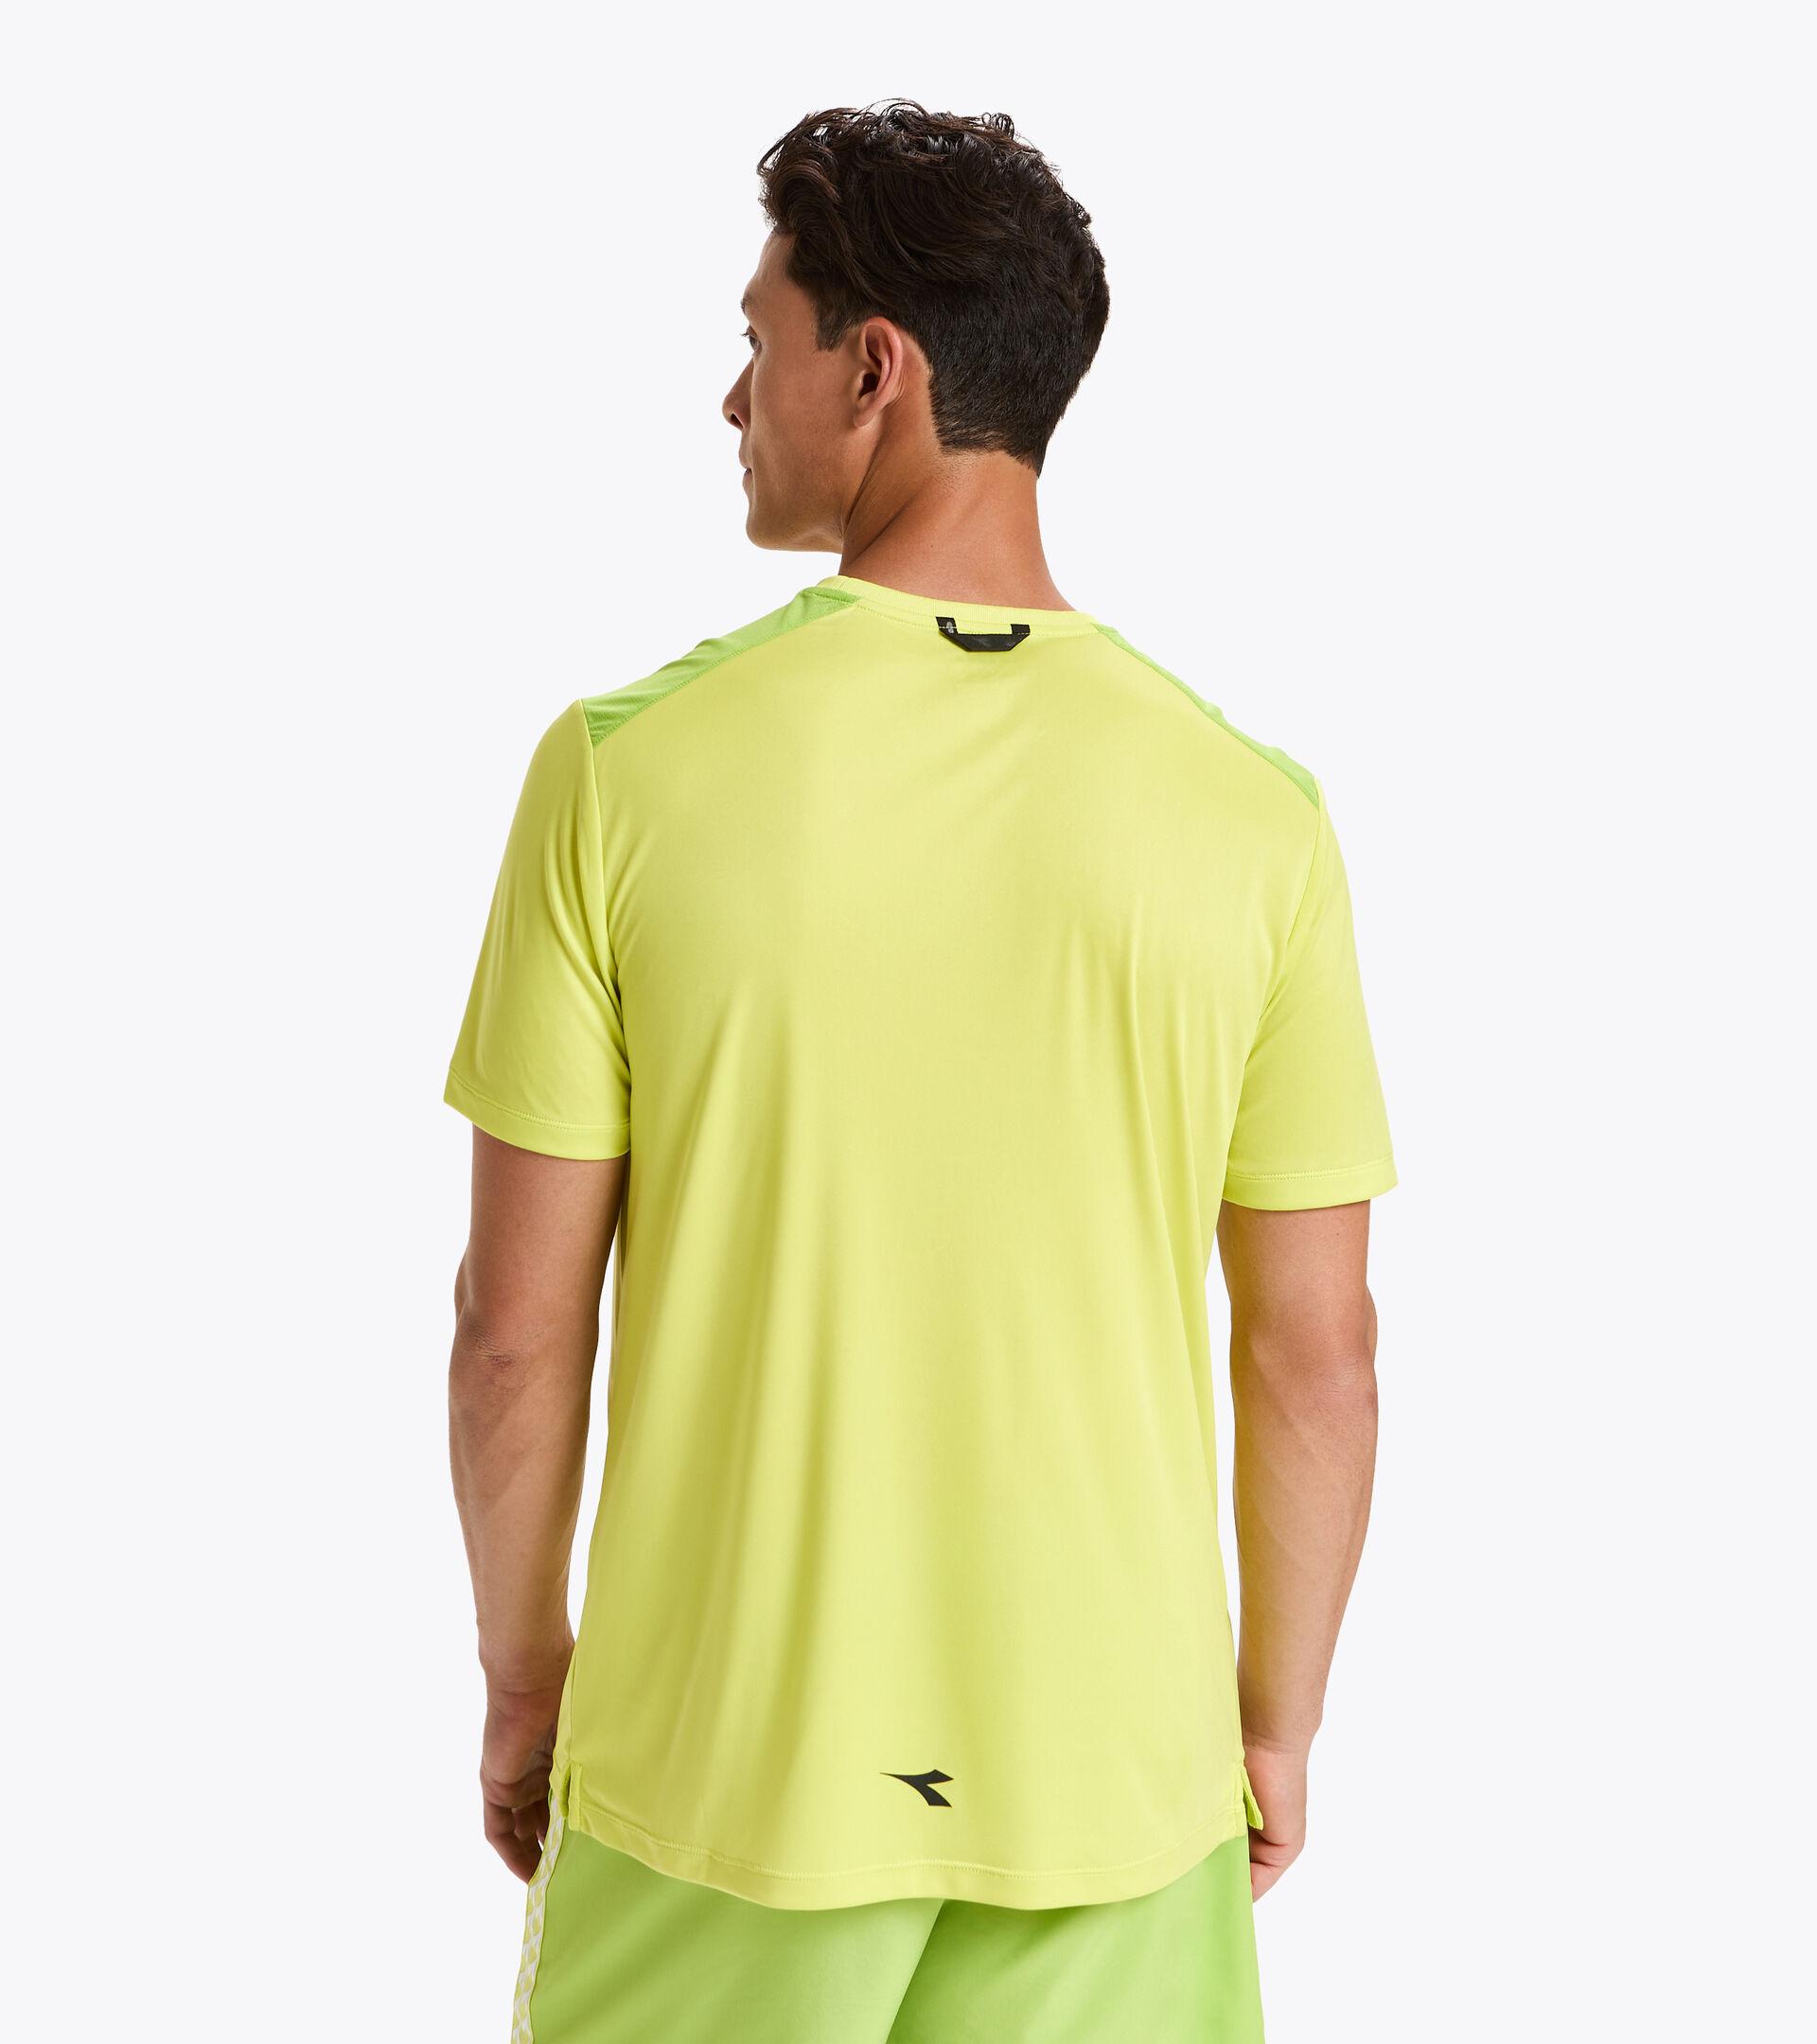 Tennis-T-Shirt - Herren SS T-SHIRT CHALLENGE SCHWEFELQUELLE - Diadora